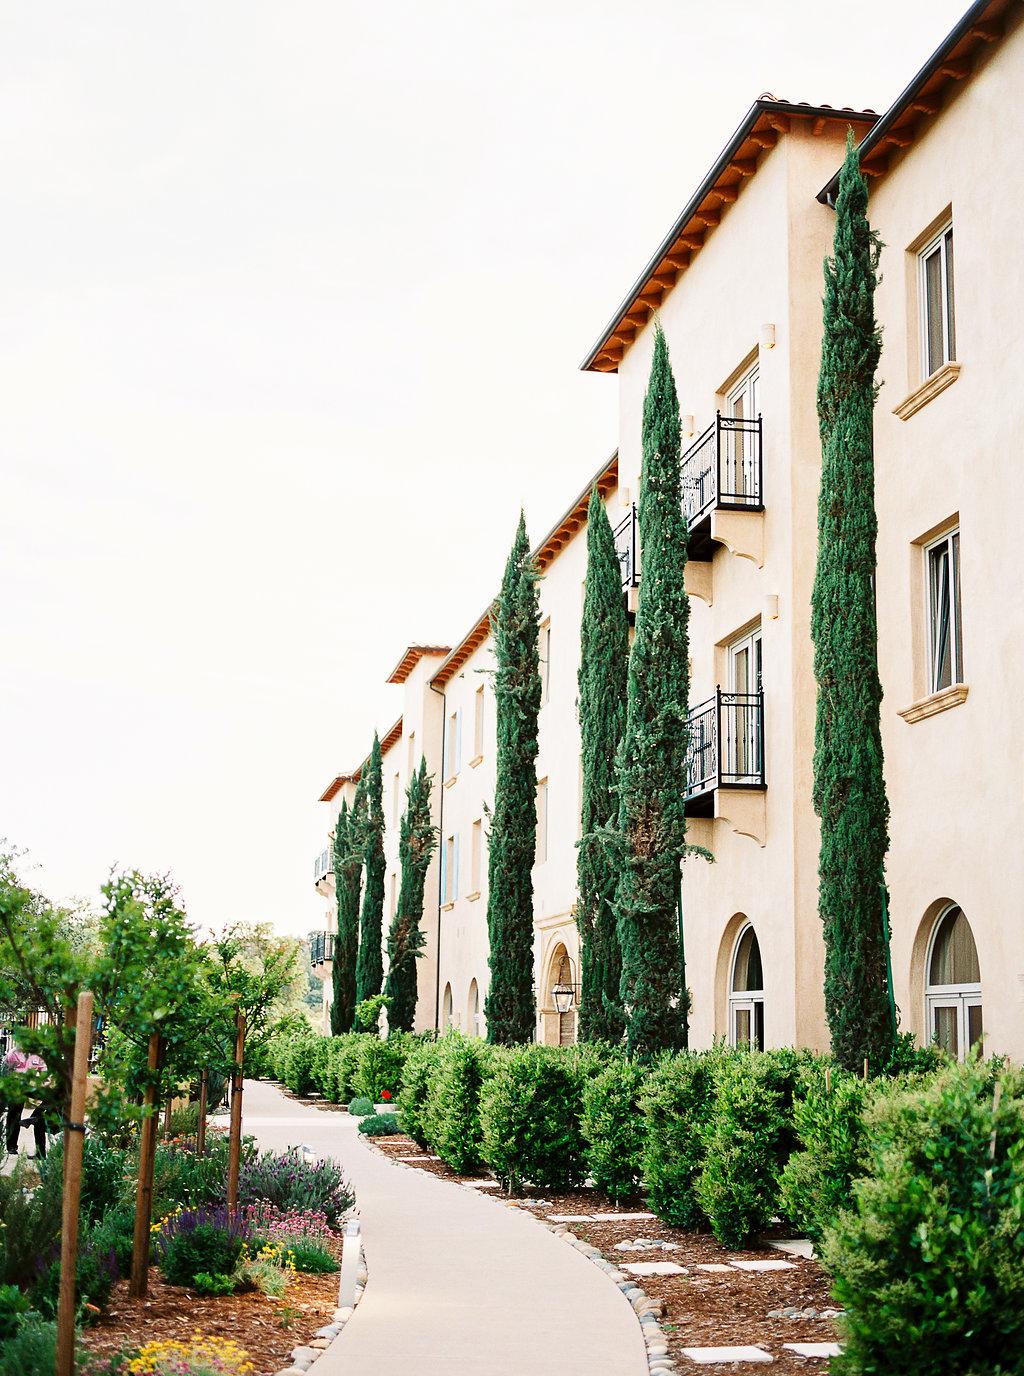 Paso Robles California - Allegretto Resort and Vineyards - Bridal Session - fine art film photographer Tanja Kibogo4.JPG